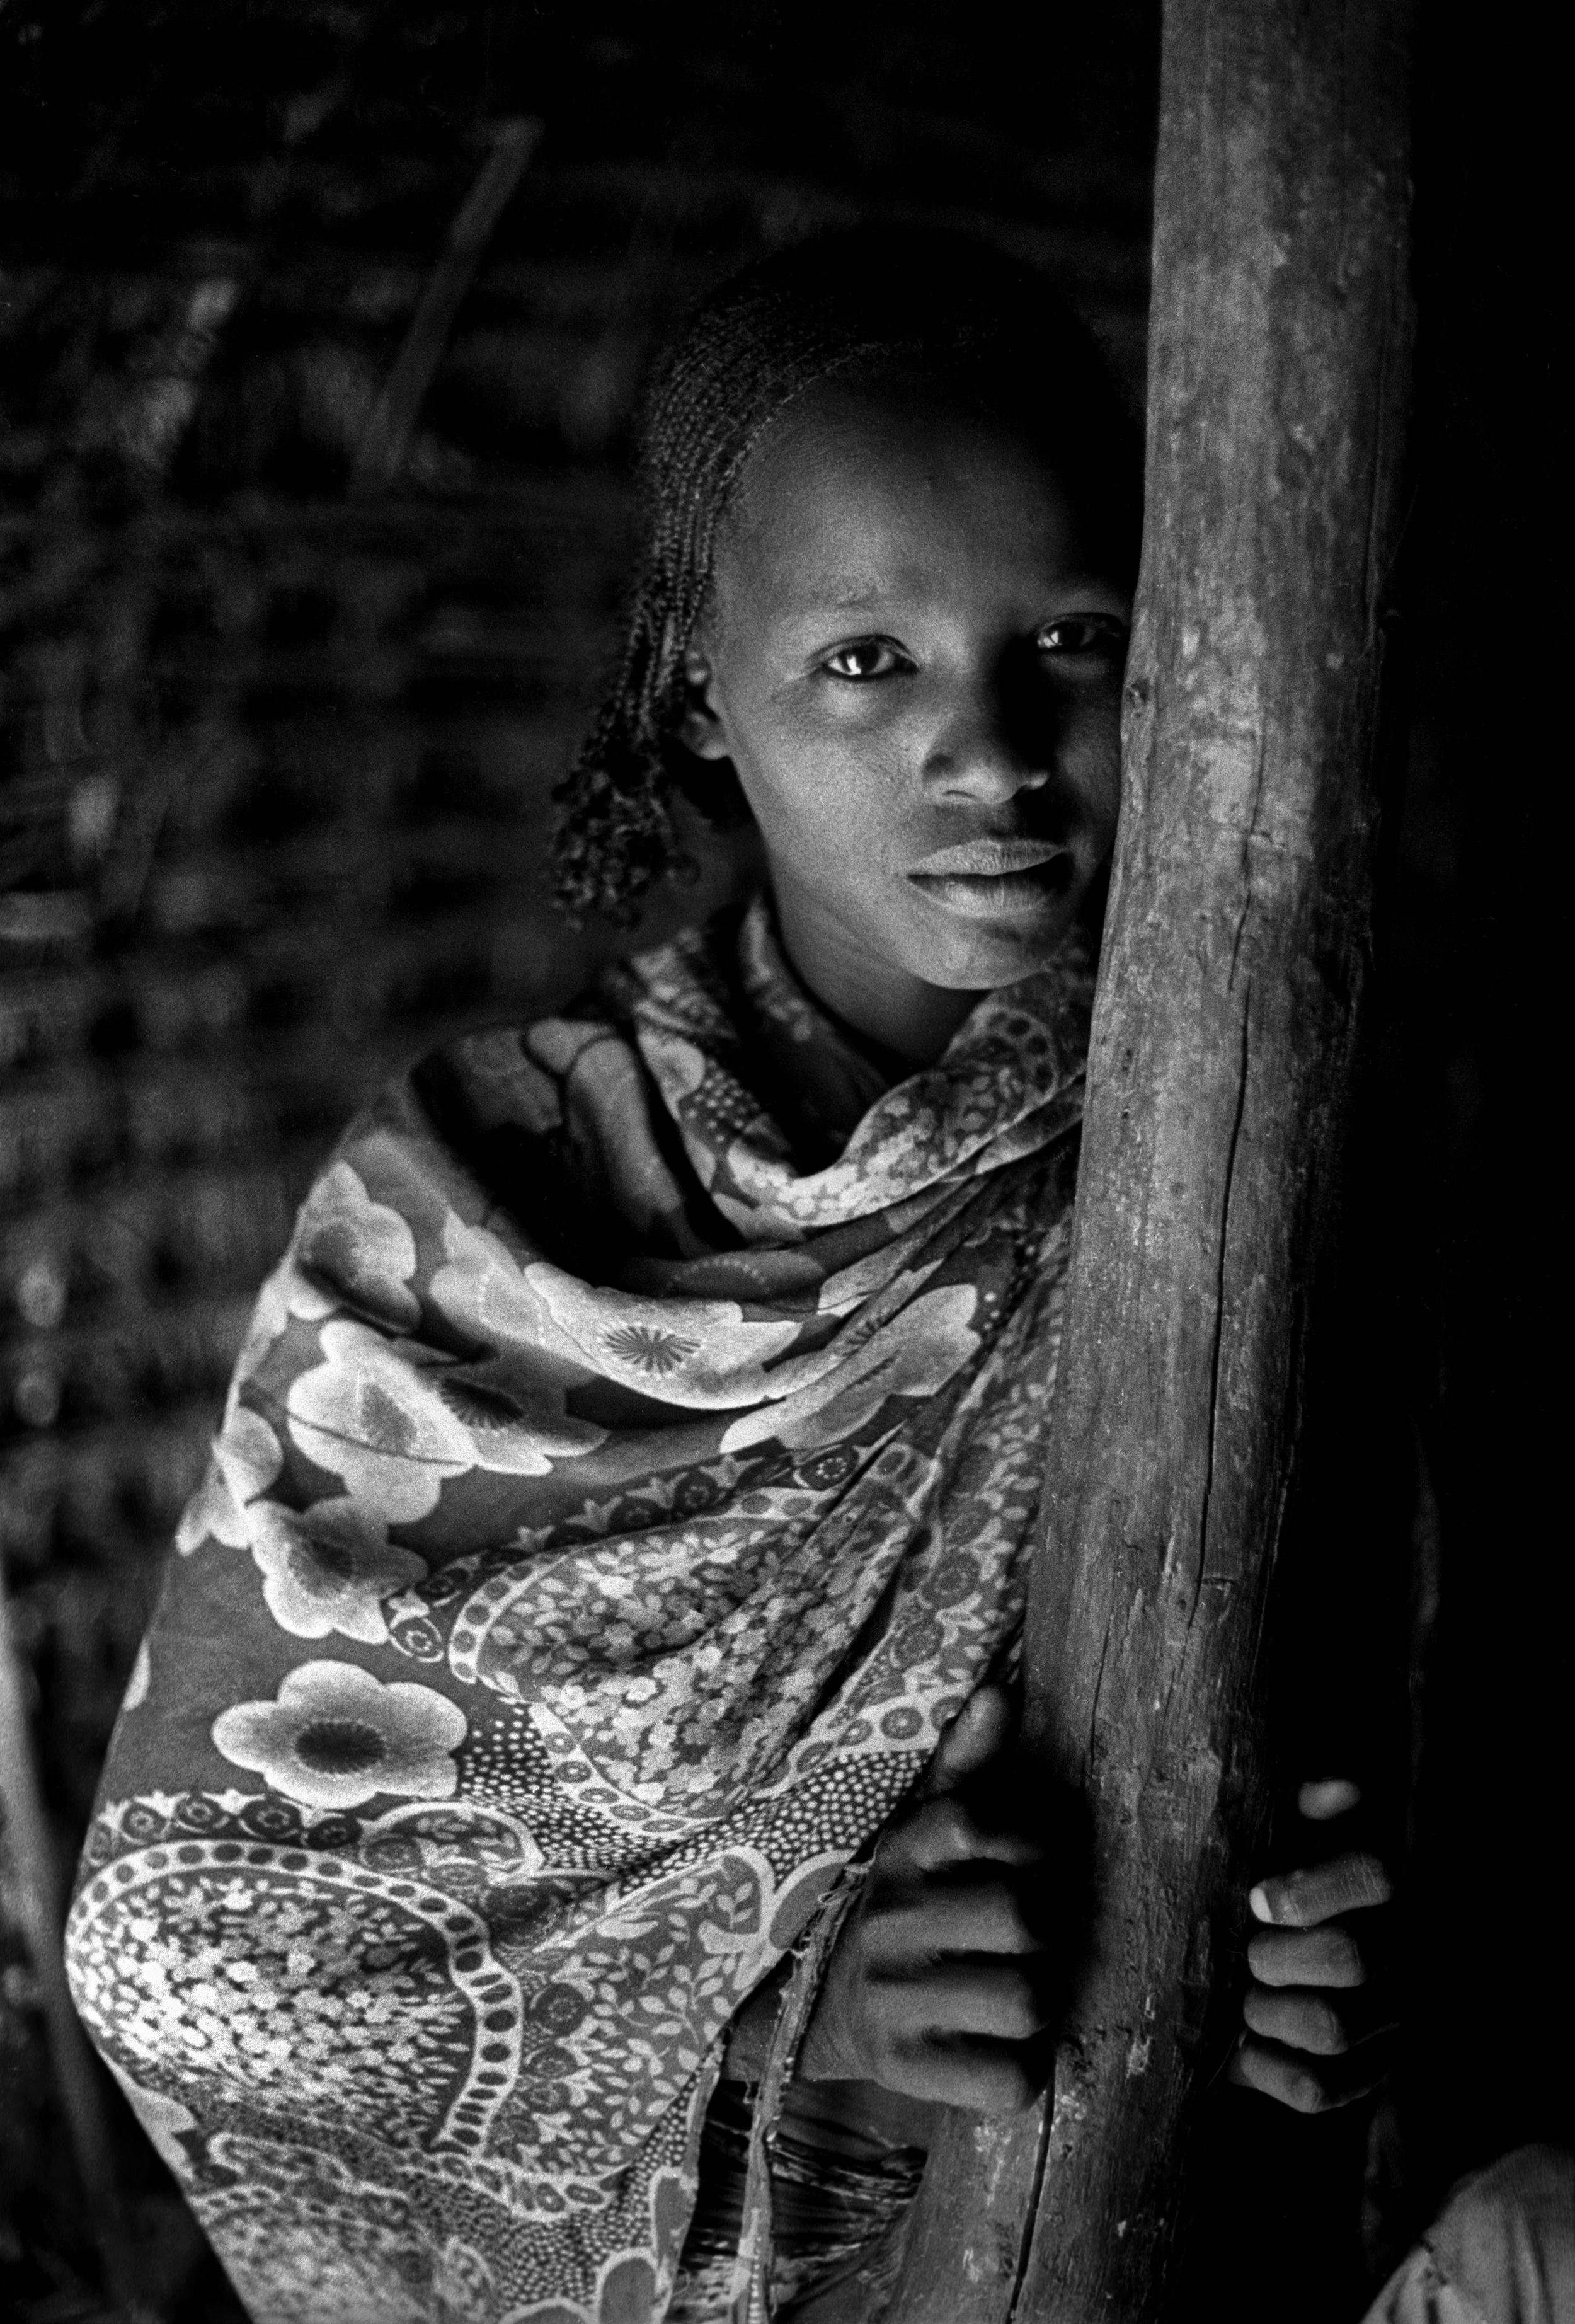 Gabbra girl, Sololo, Kenya